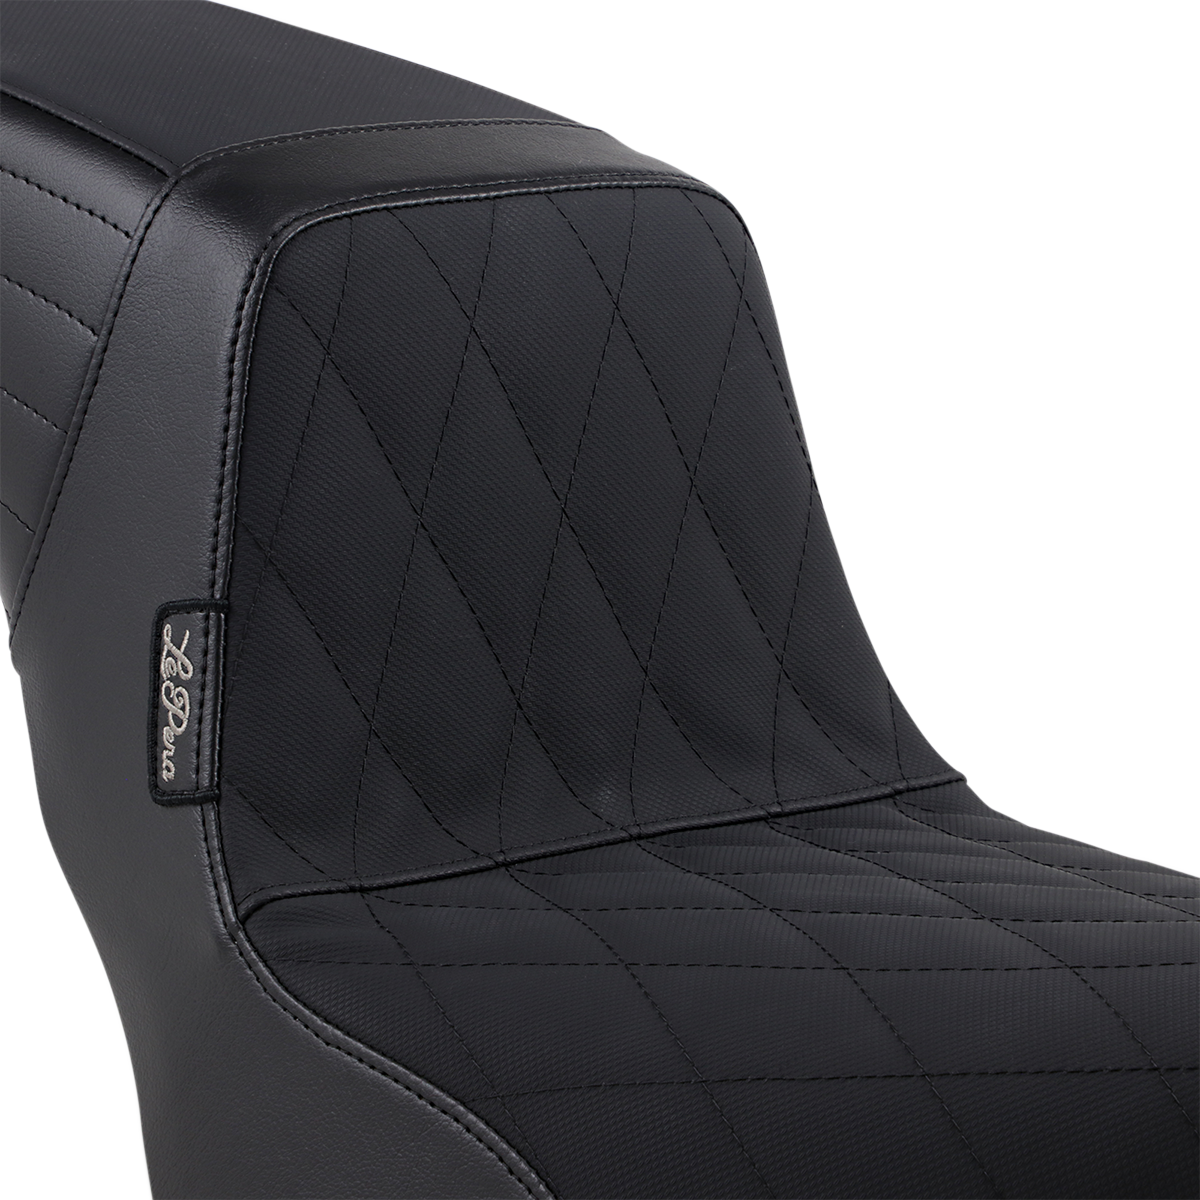 Le Pera Vinyl Black Diamond Grip Tape Kickflip Seat 18-19 Harley Softail FXBB